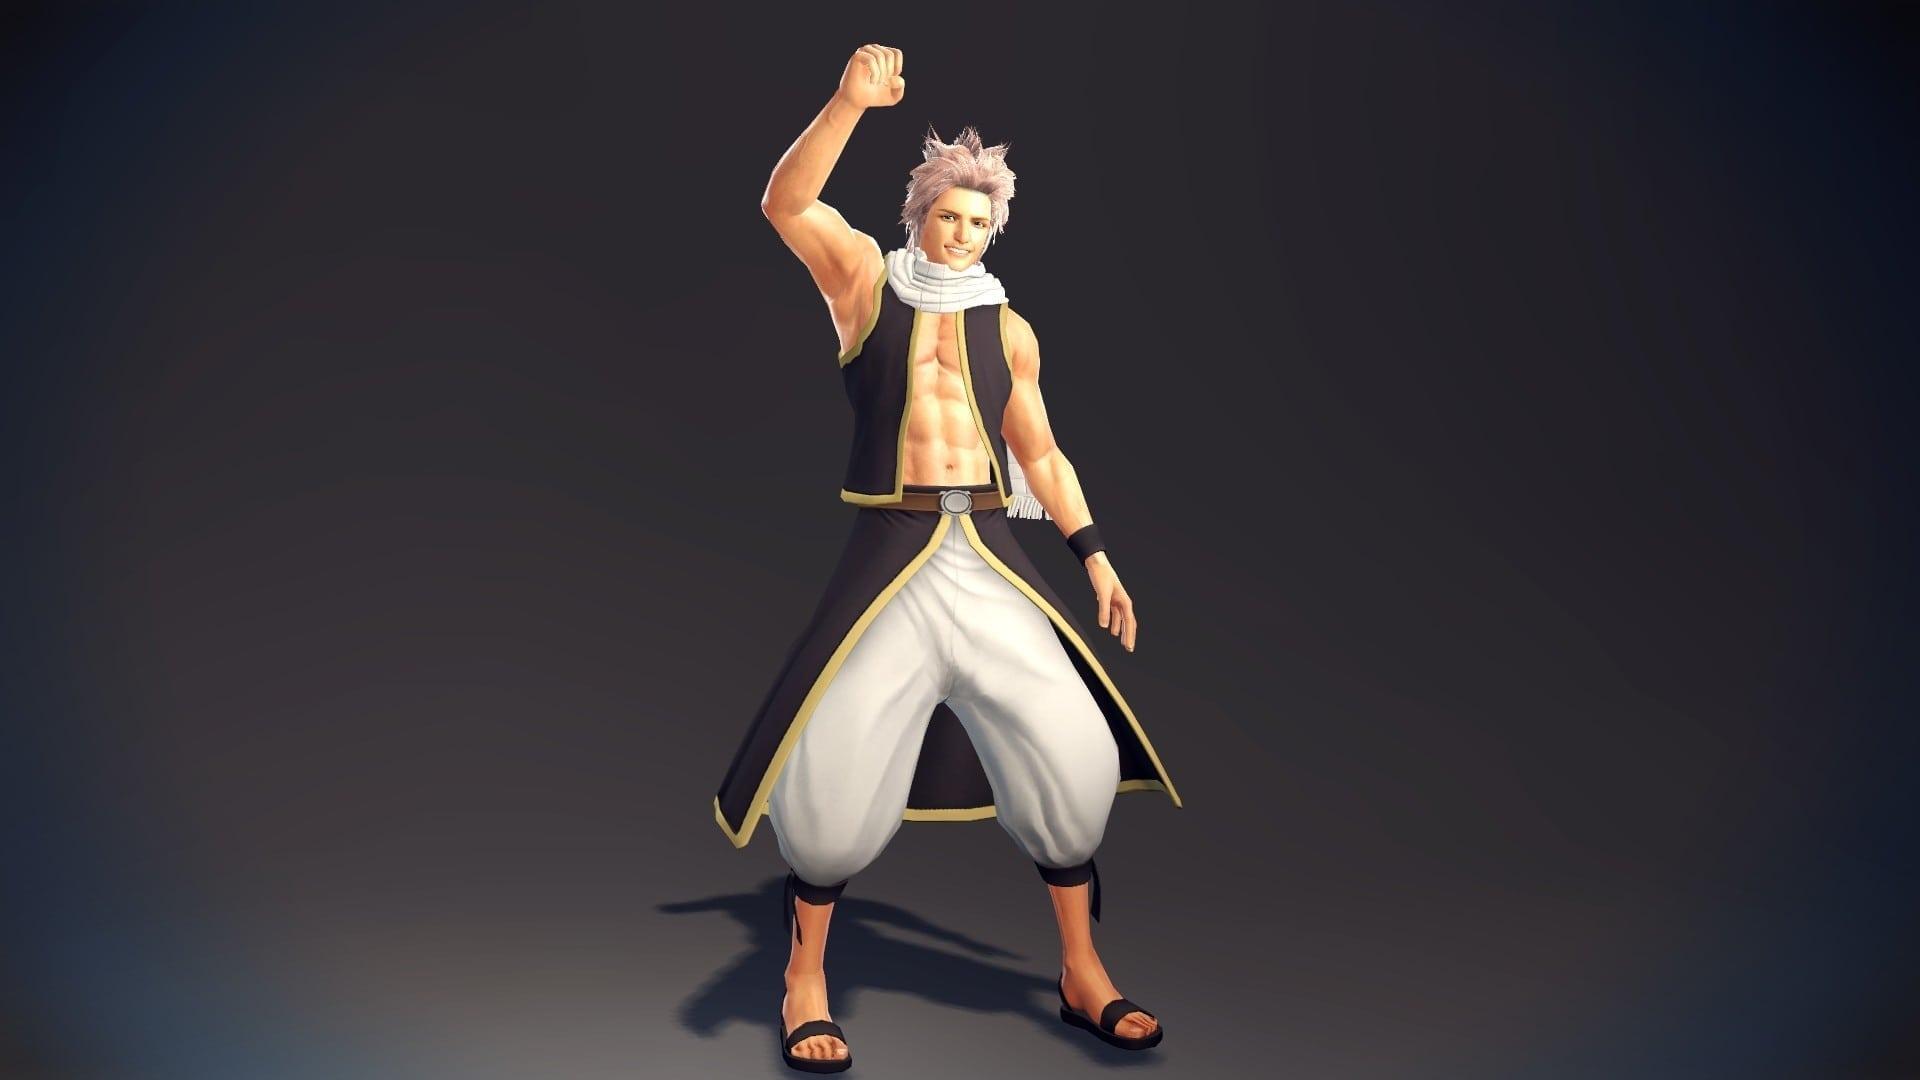 Mabinogi-Heroes-Japan-Natsu-costume.jpg